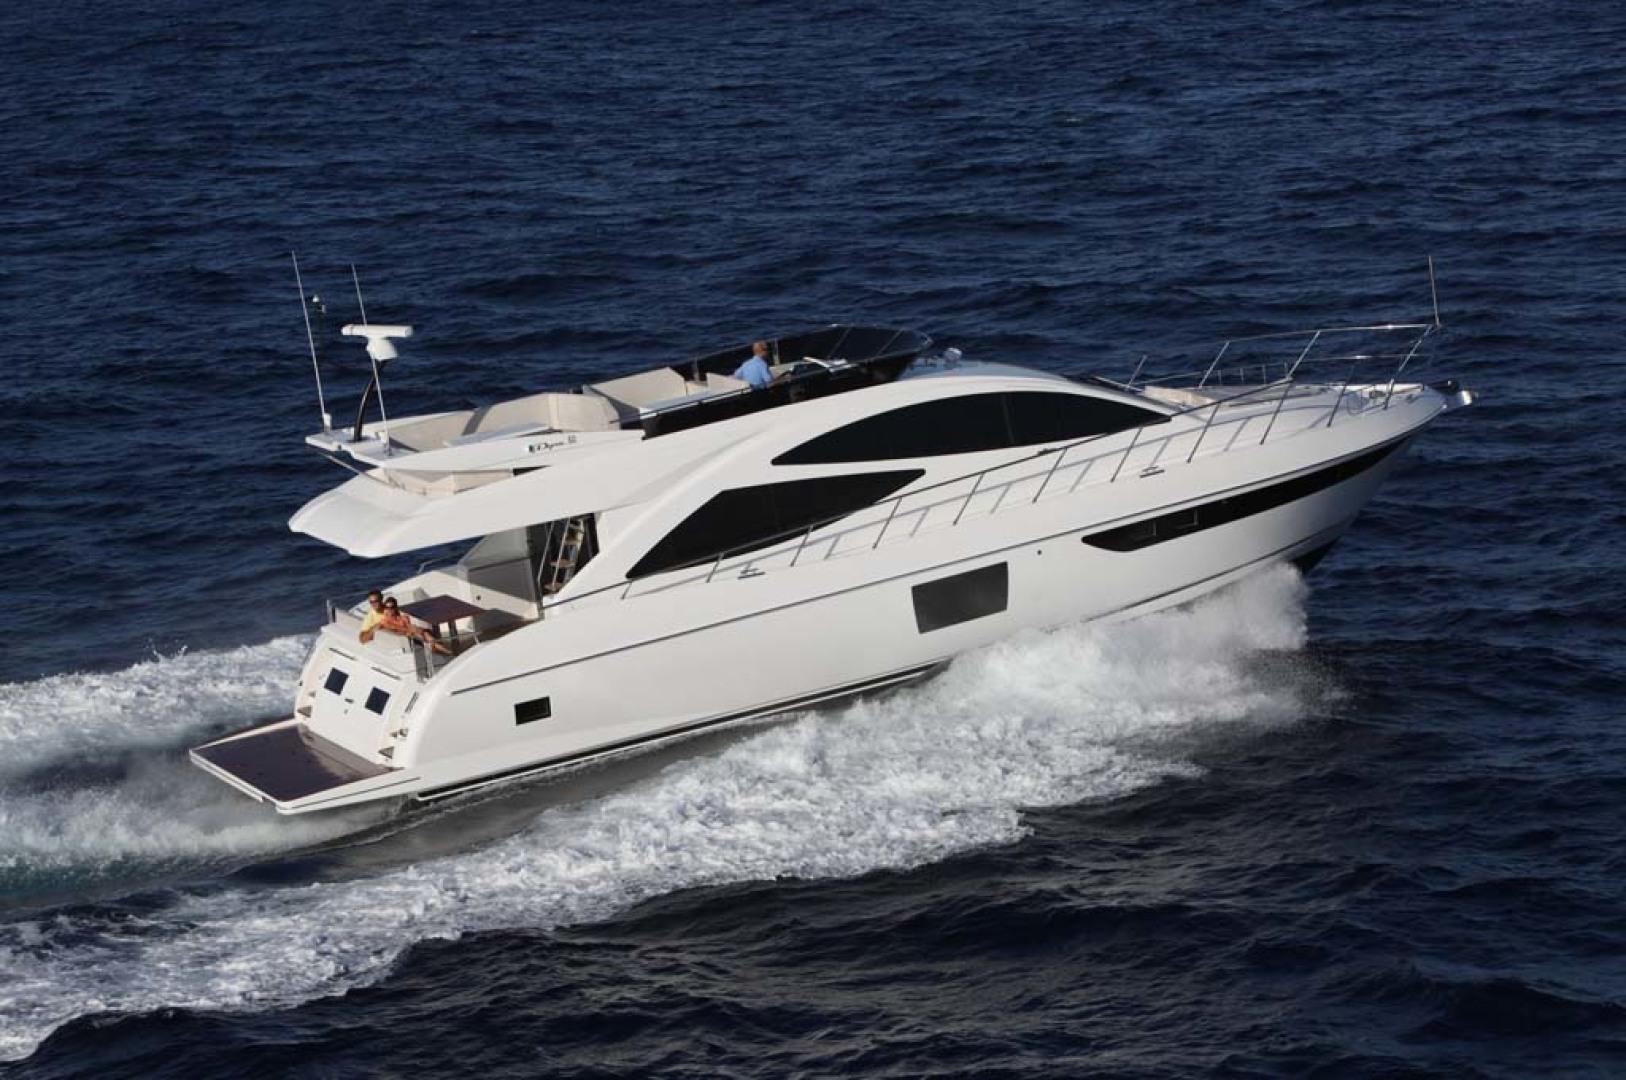 2021 Dyna Yachts 63' Flybridge